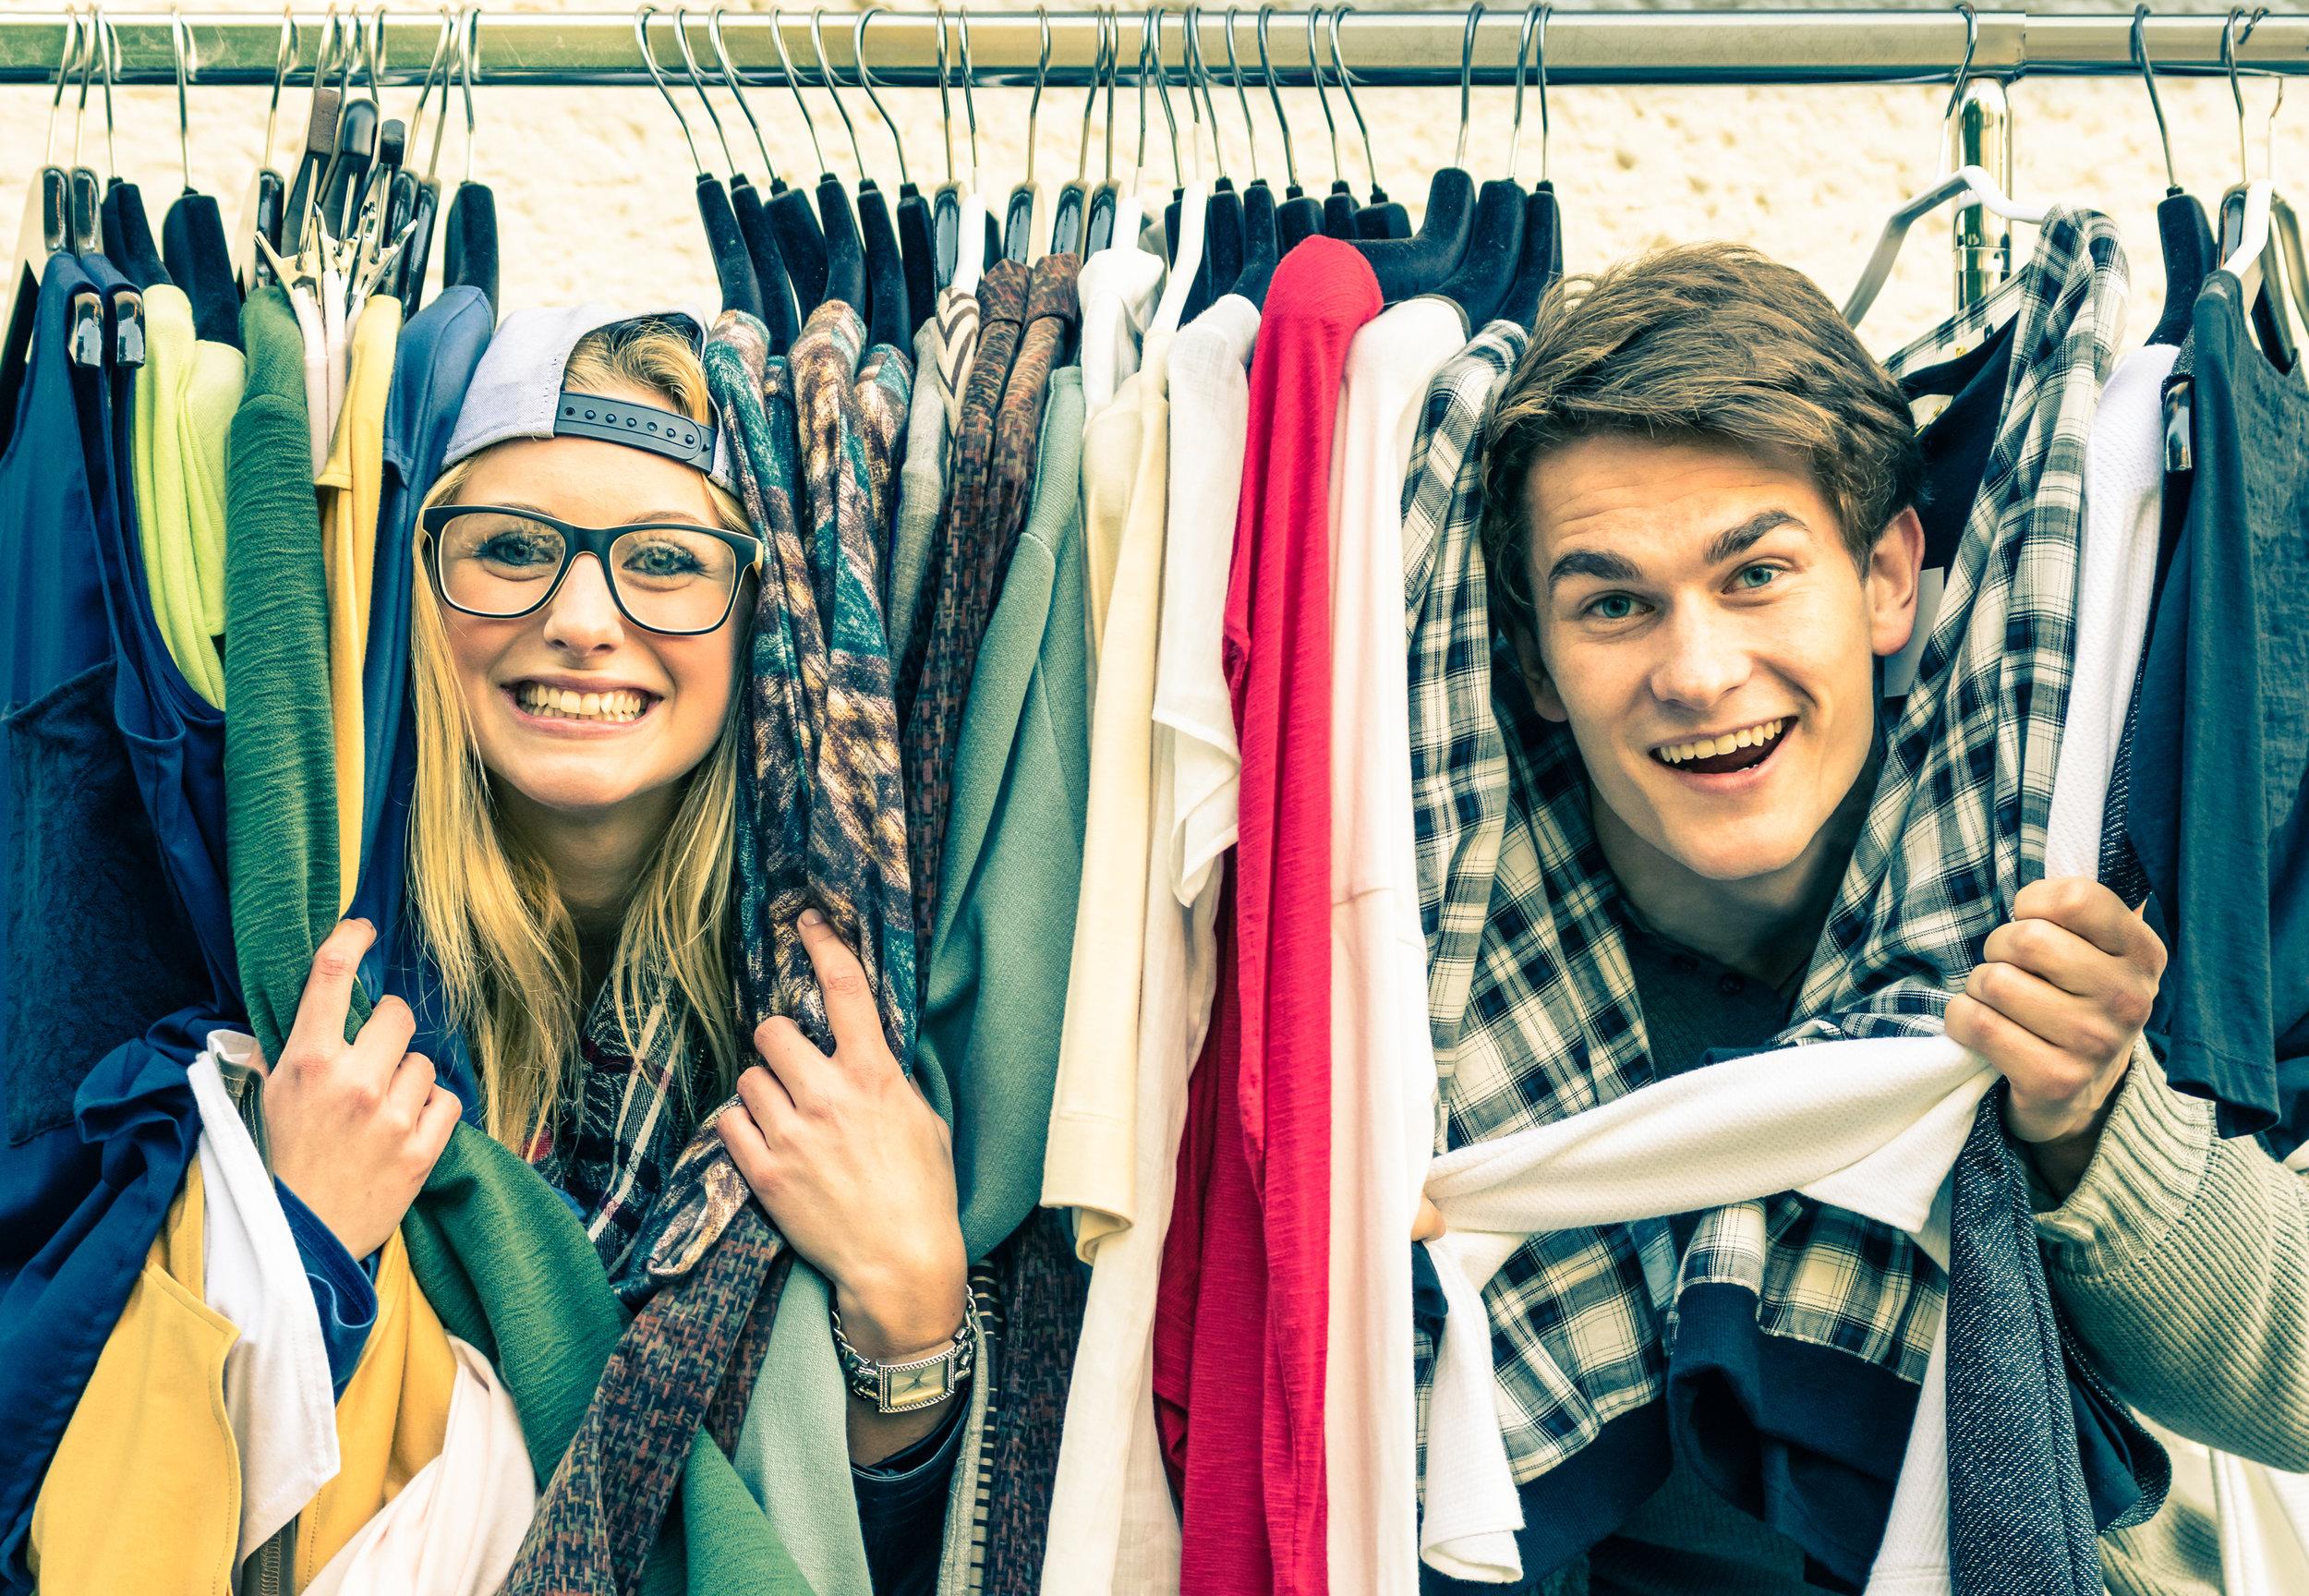 A Vintage Adventure vintage clothing shopping tour